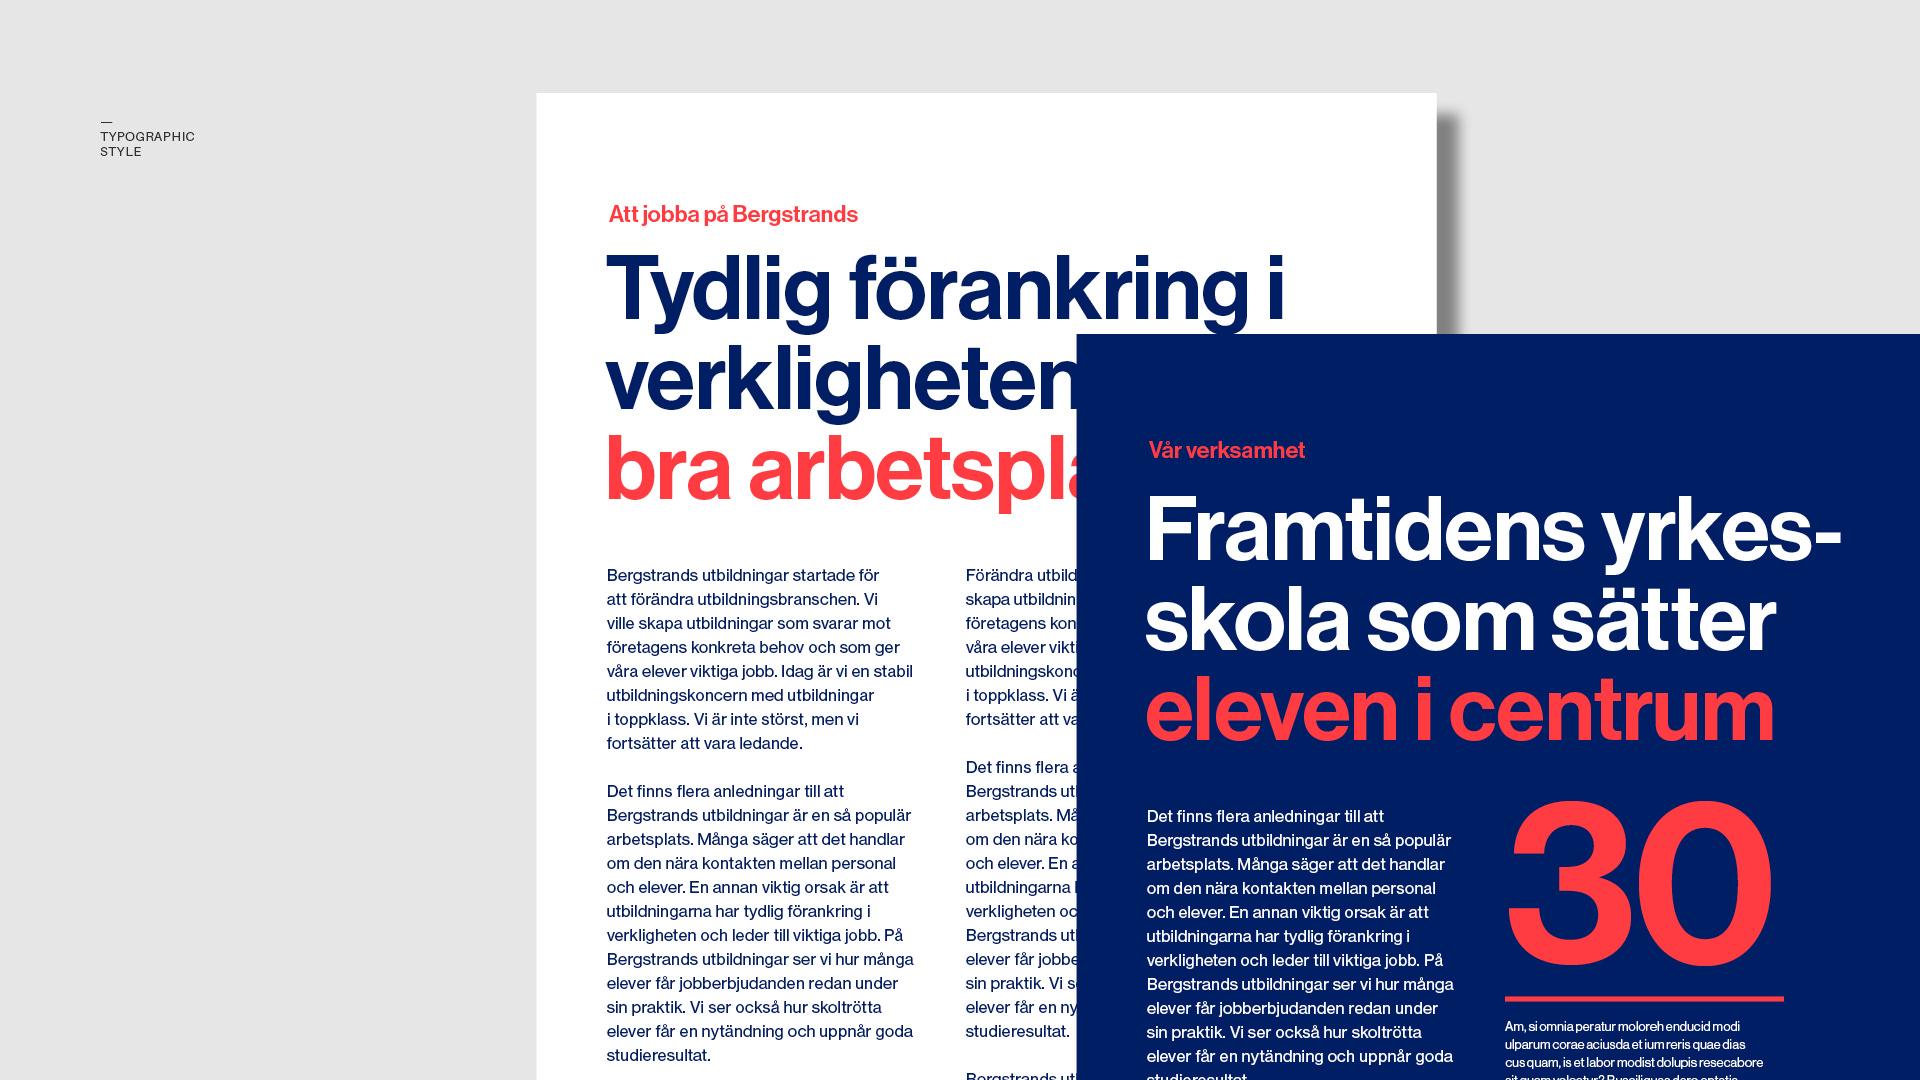 typography-style-design-bergstrand-2